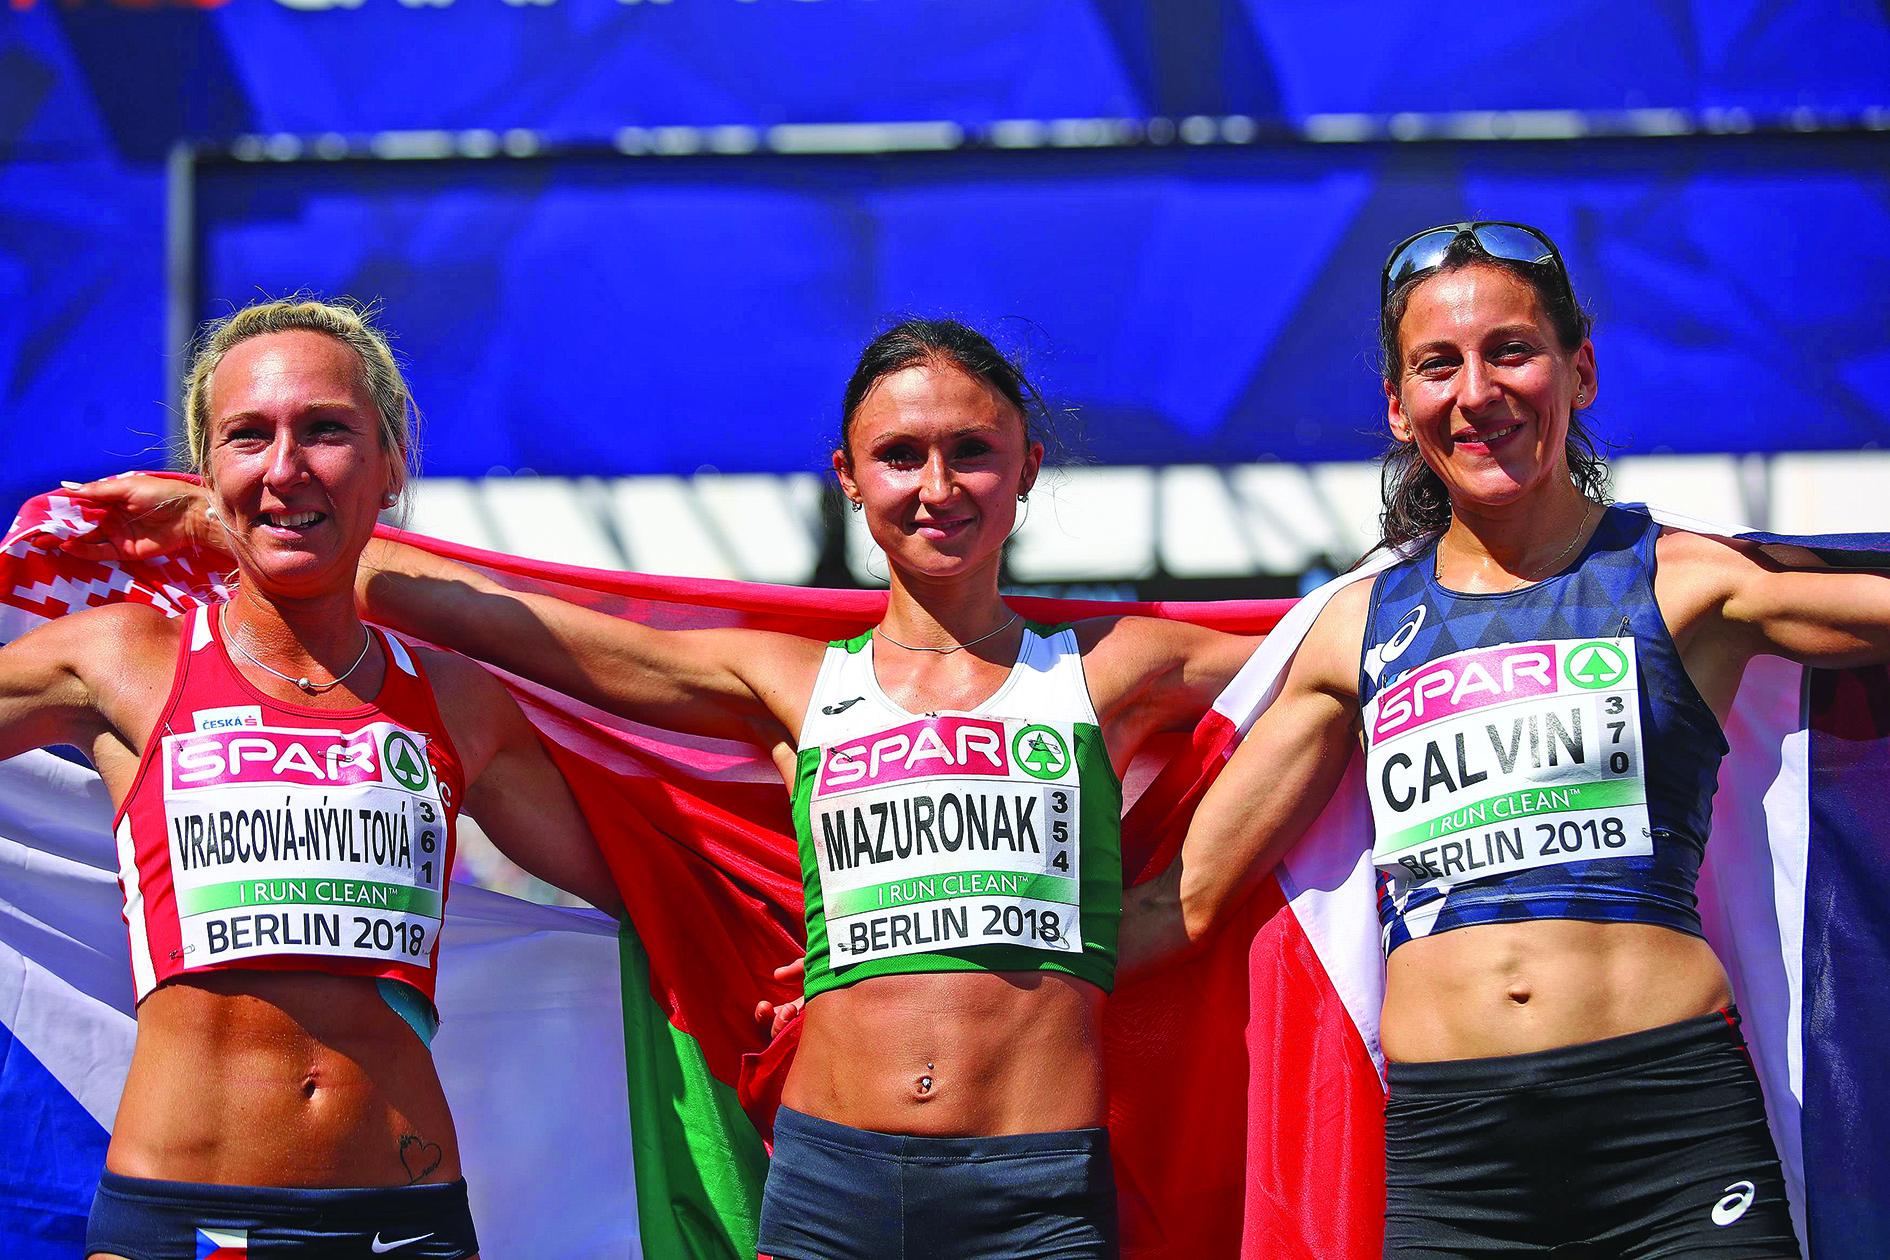 Athletics: Mazuronak overcomes nosebleed to win European marathon